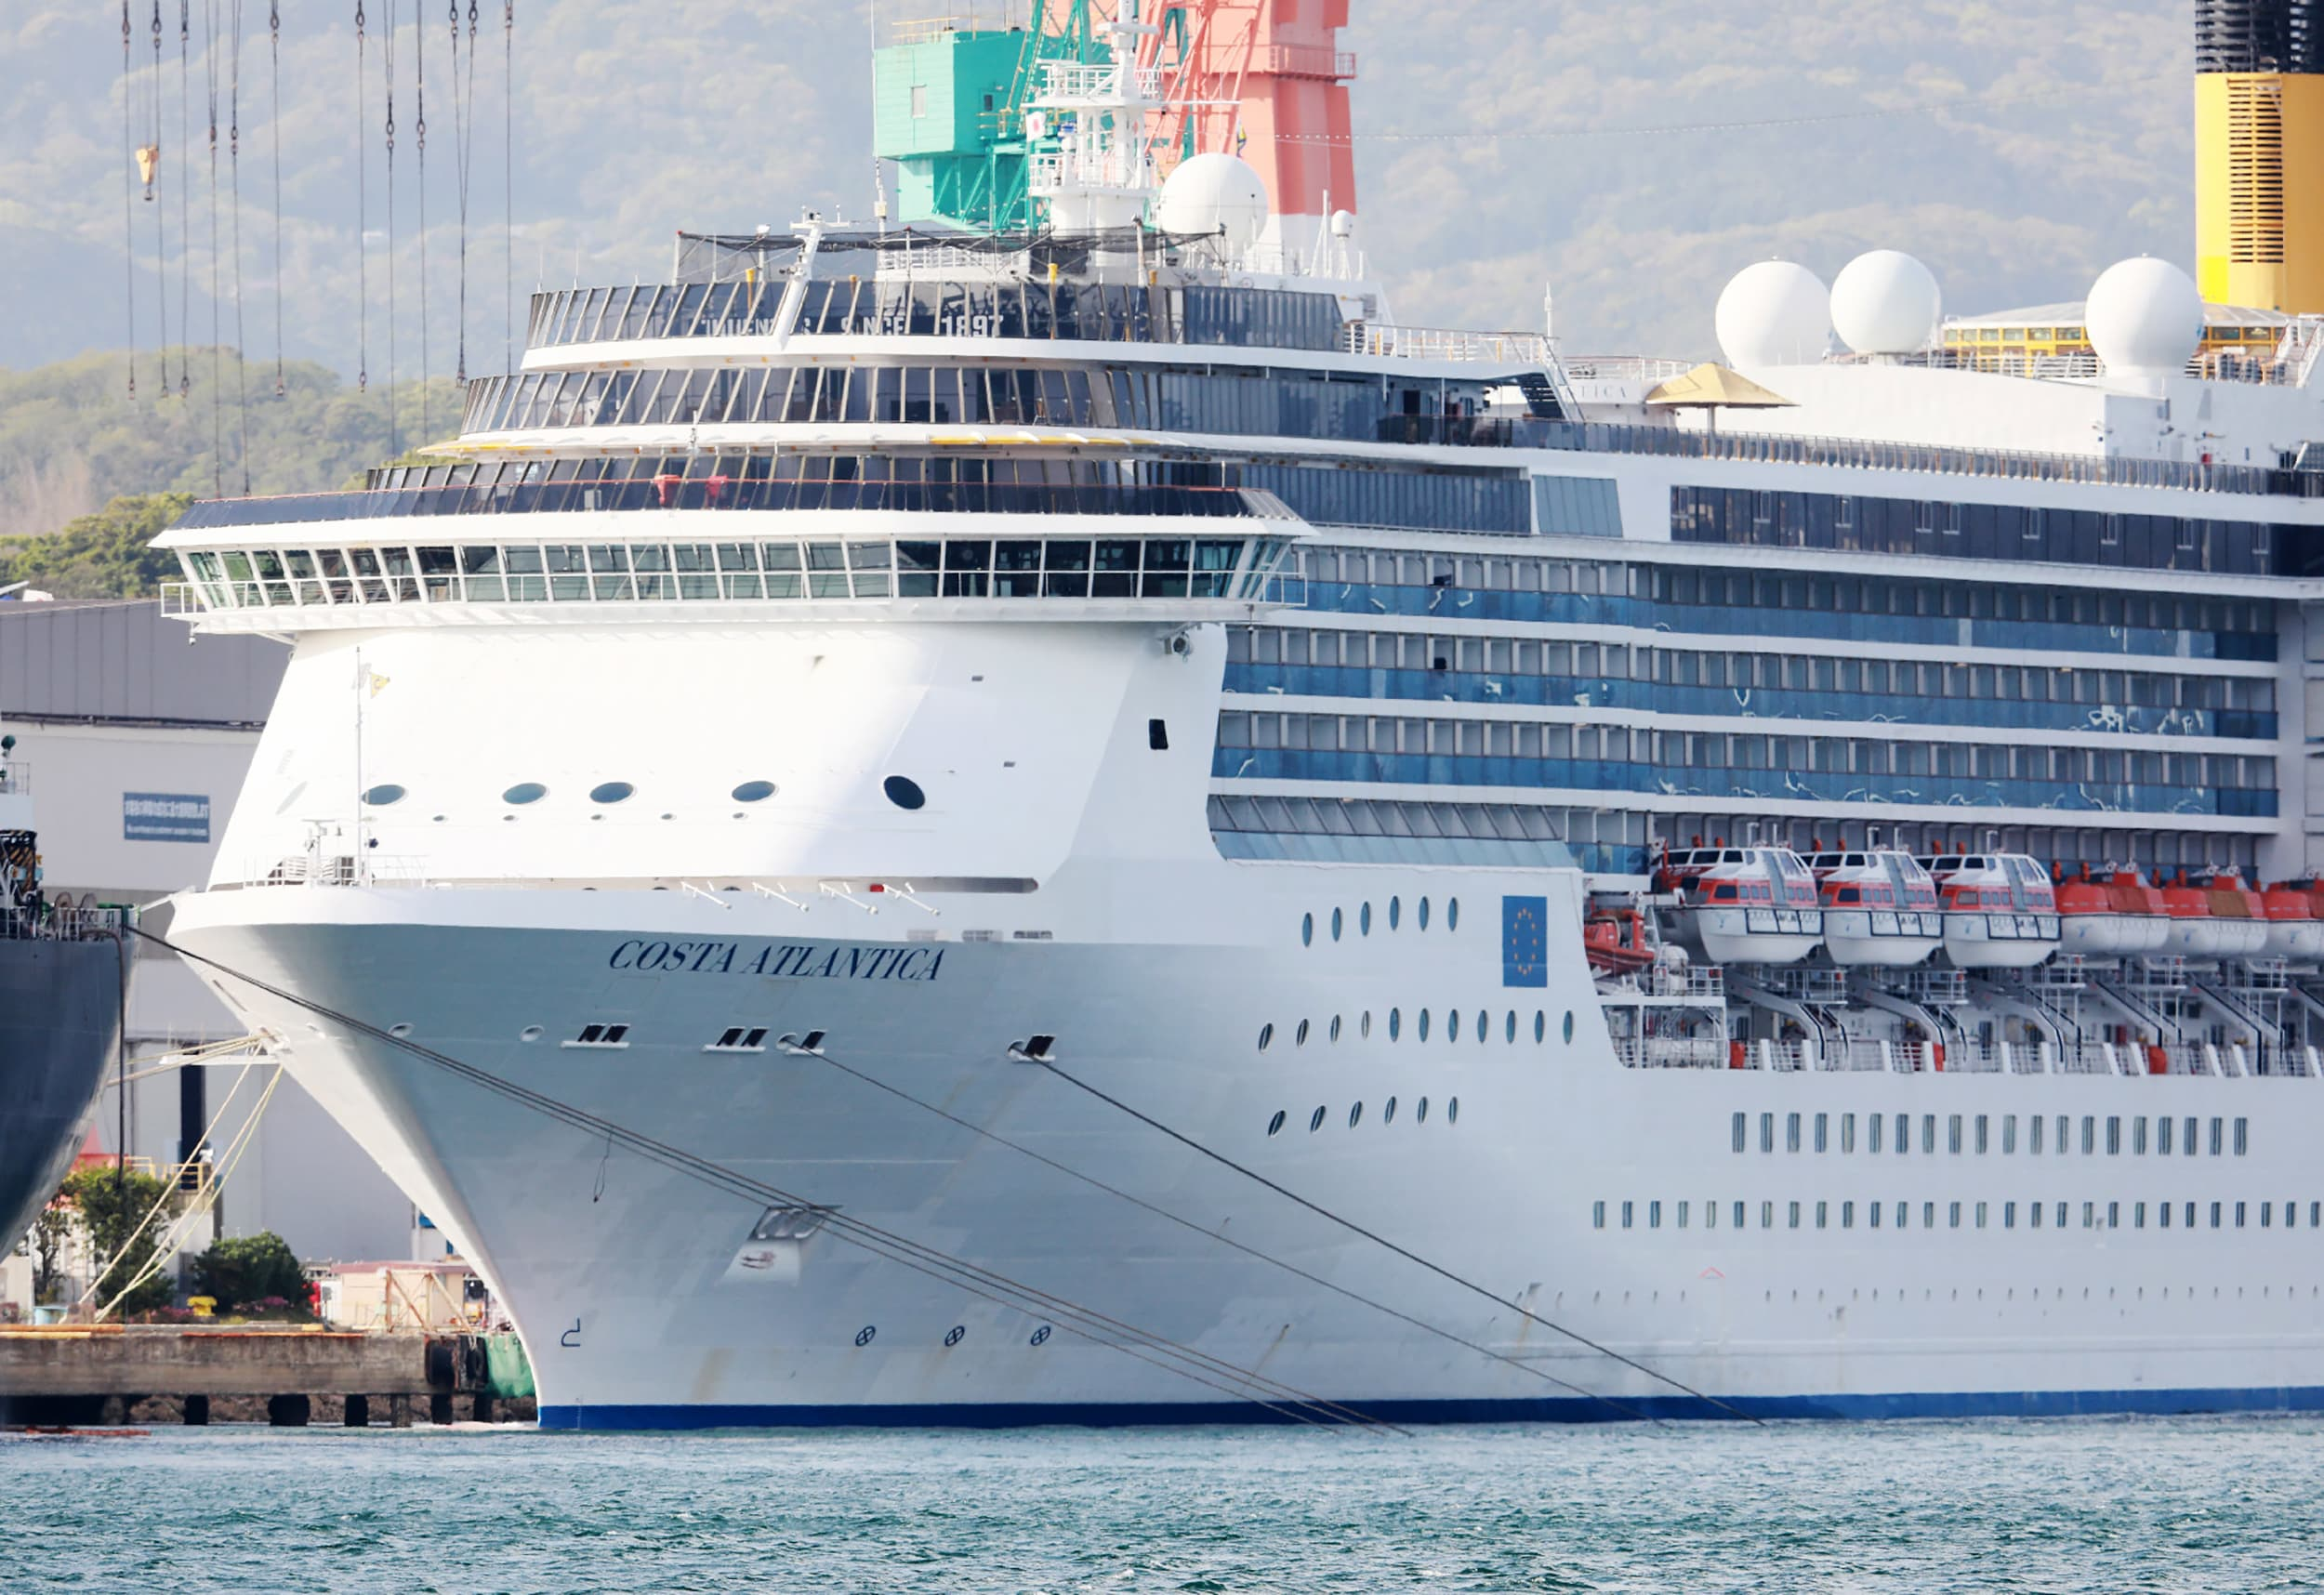 Coronavirus live updates: Japan discovers 60 more cases on Italian cruise ship - CNBC